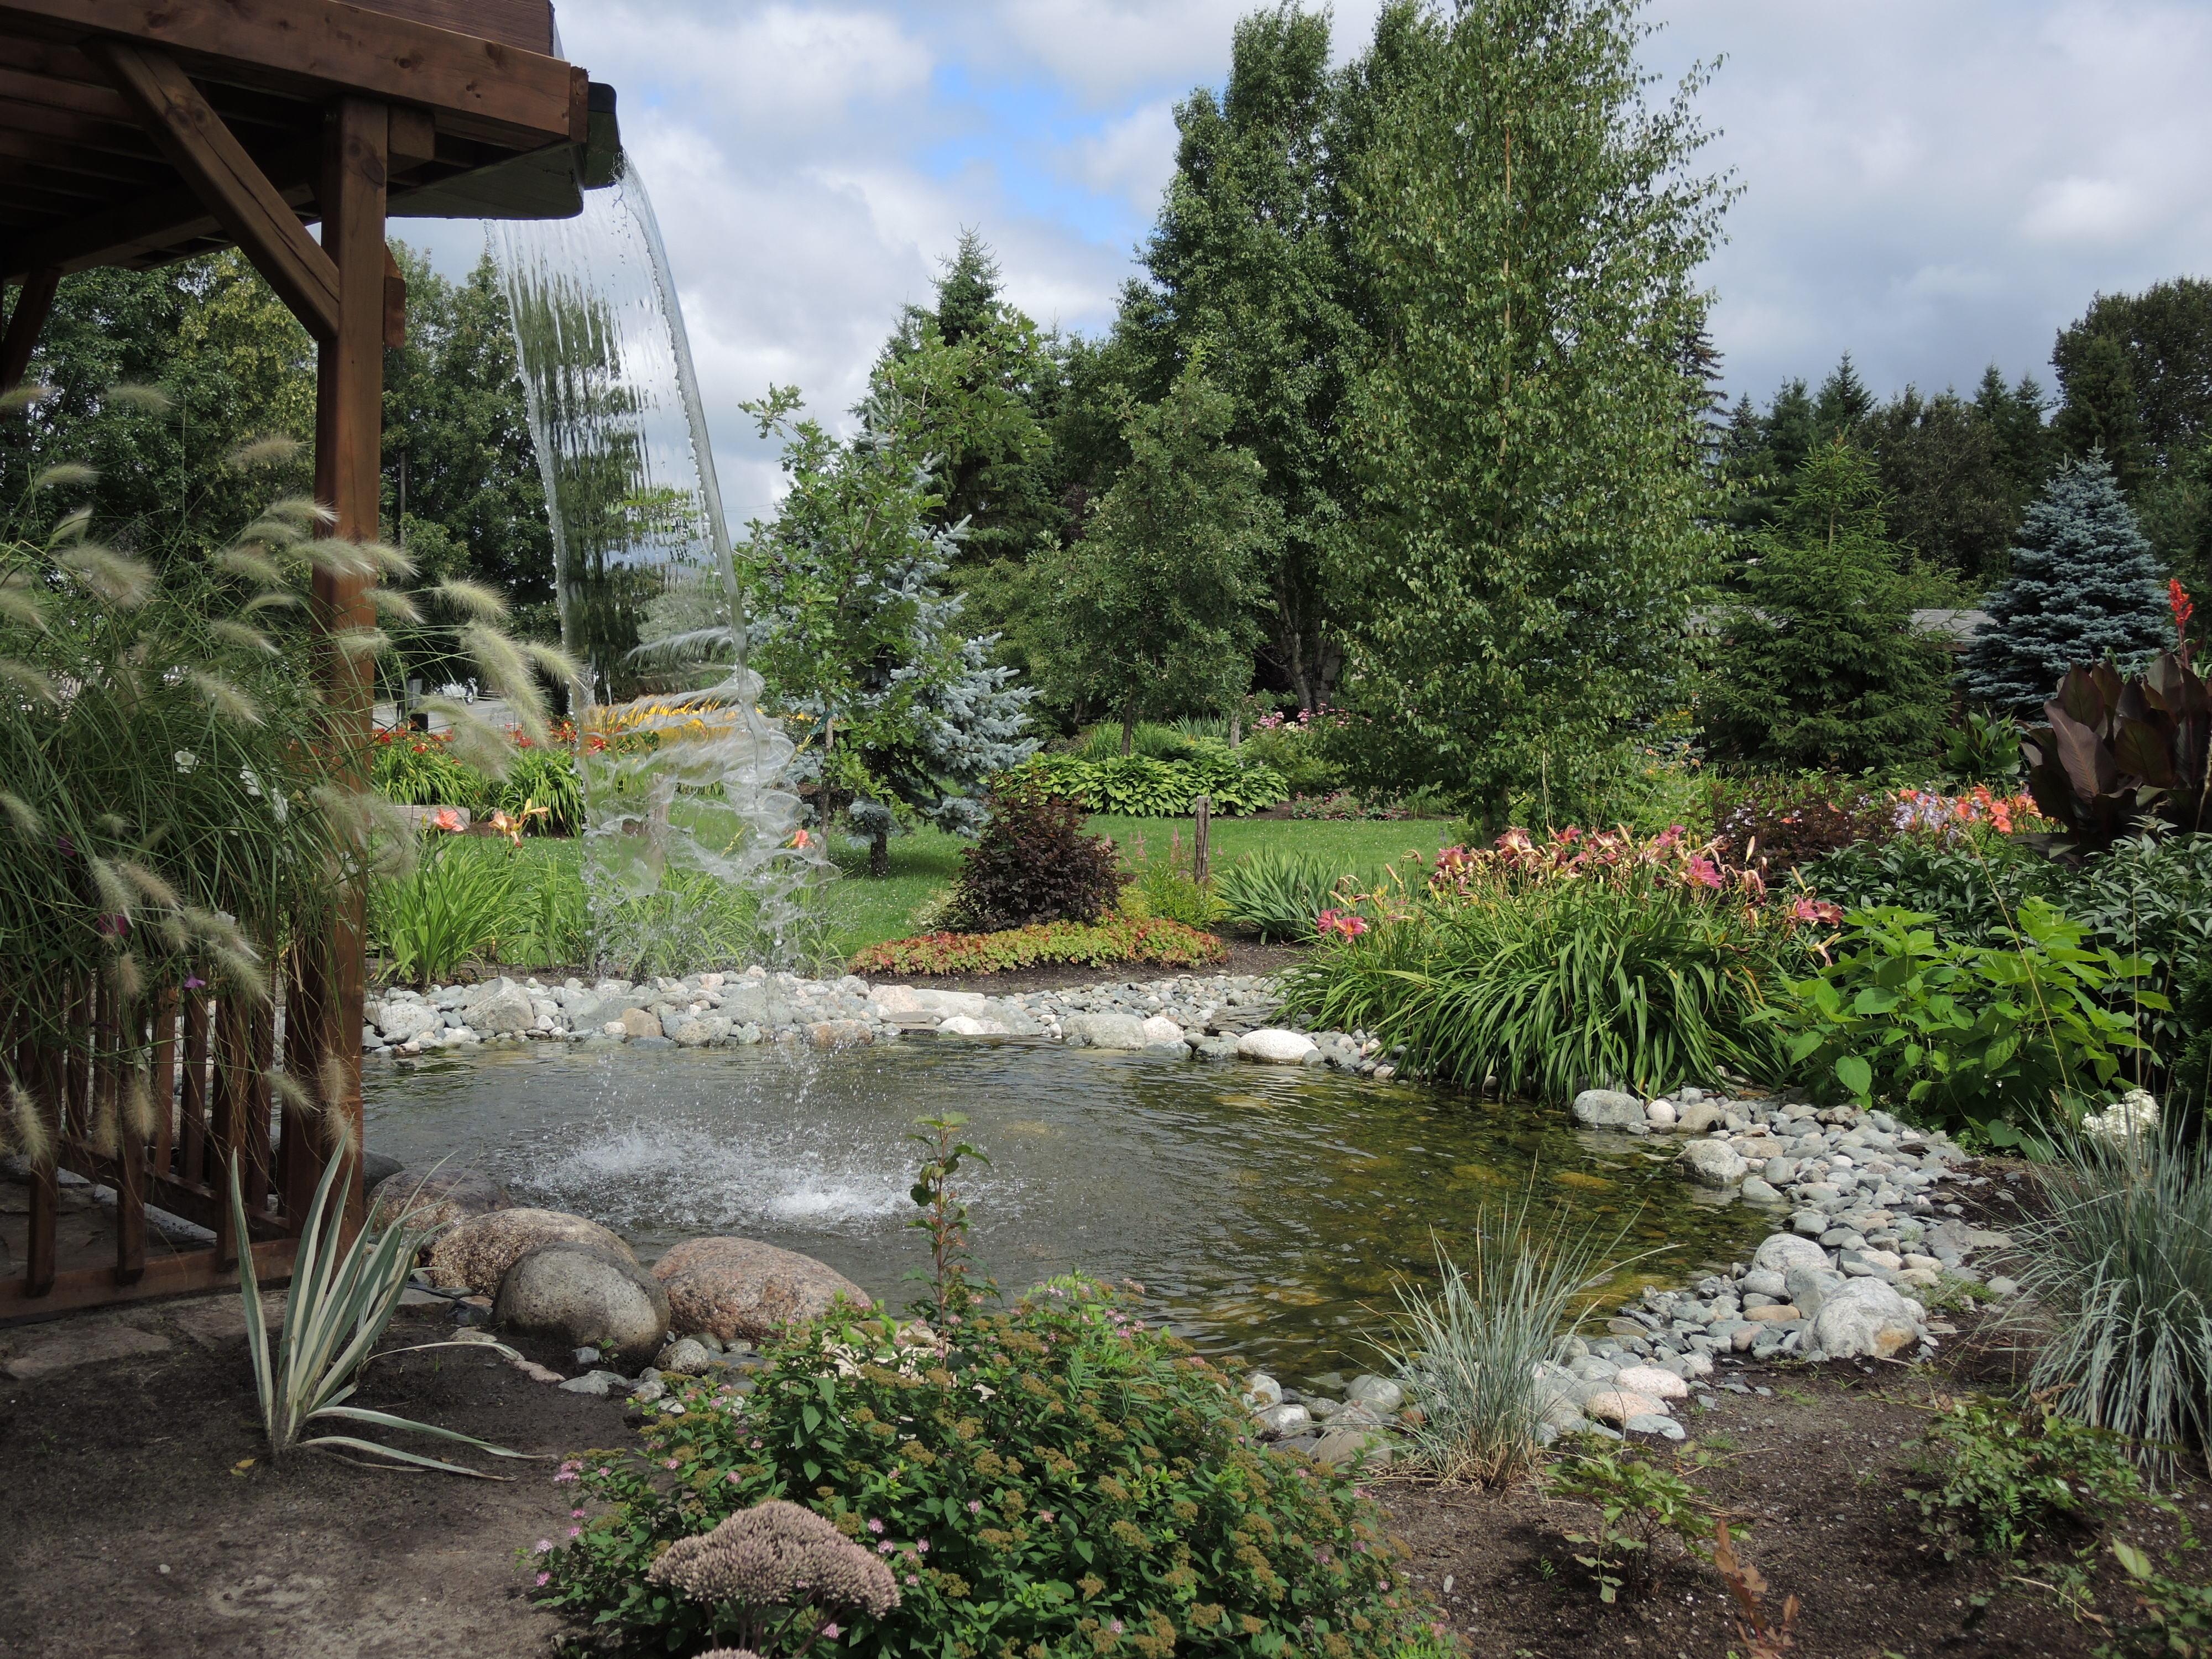 Vert parc Fonds Rouyn-Noranda